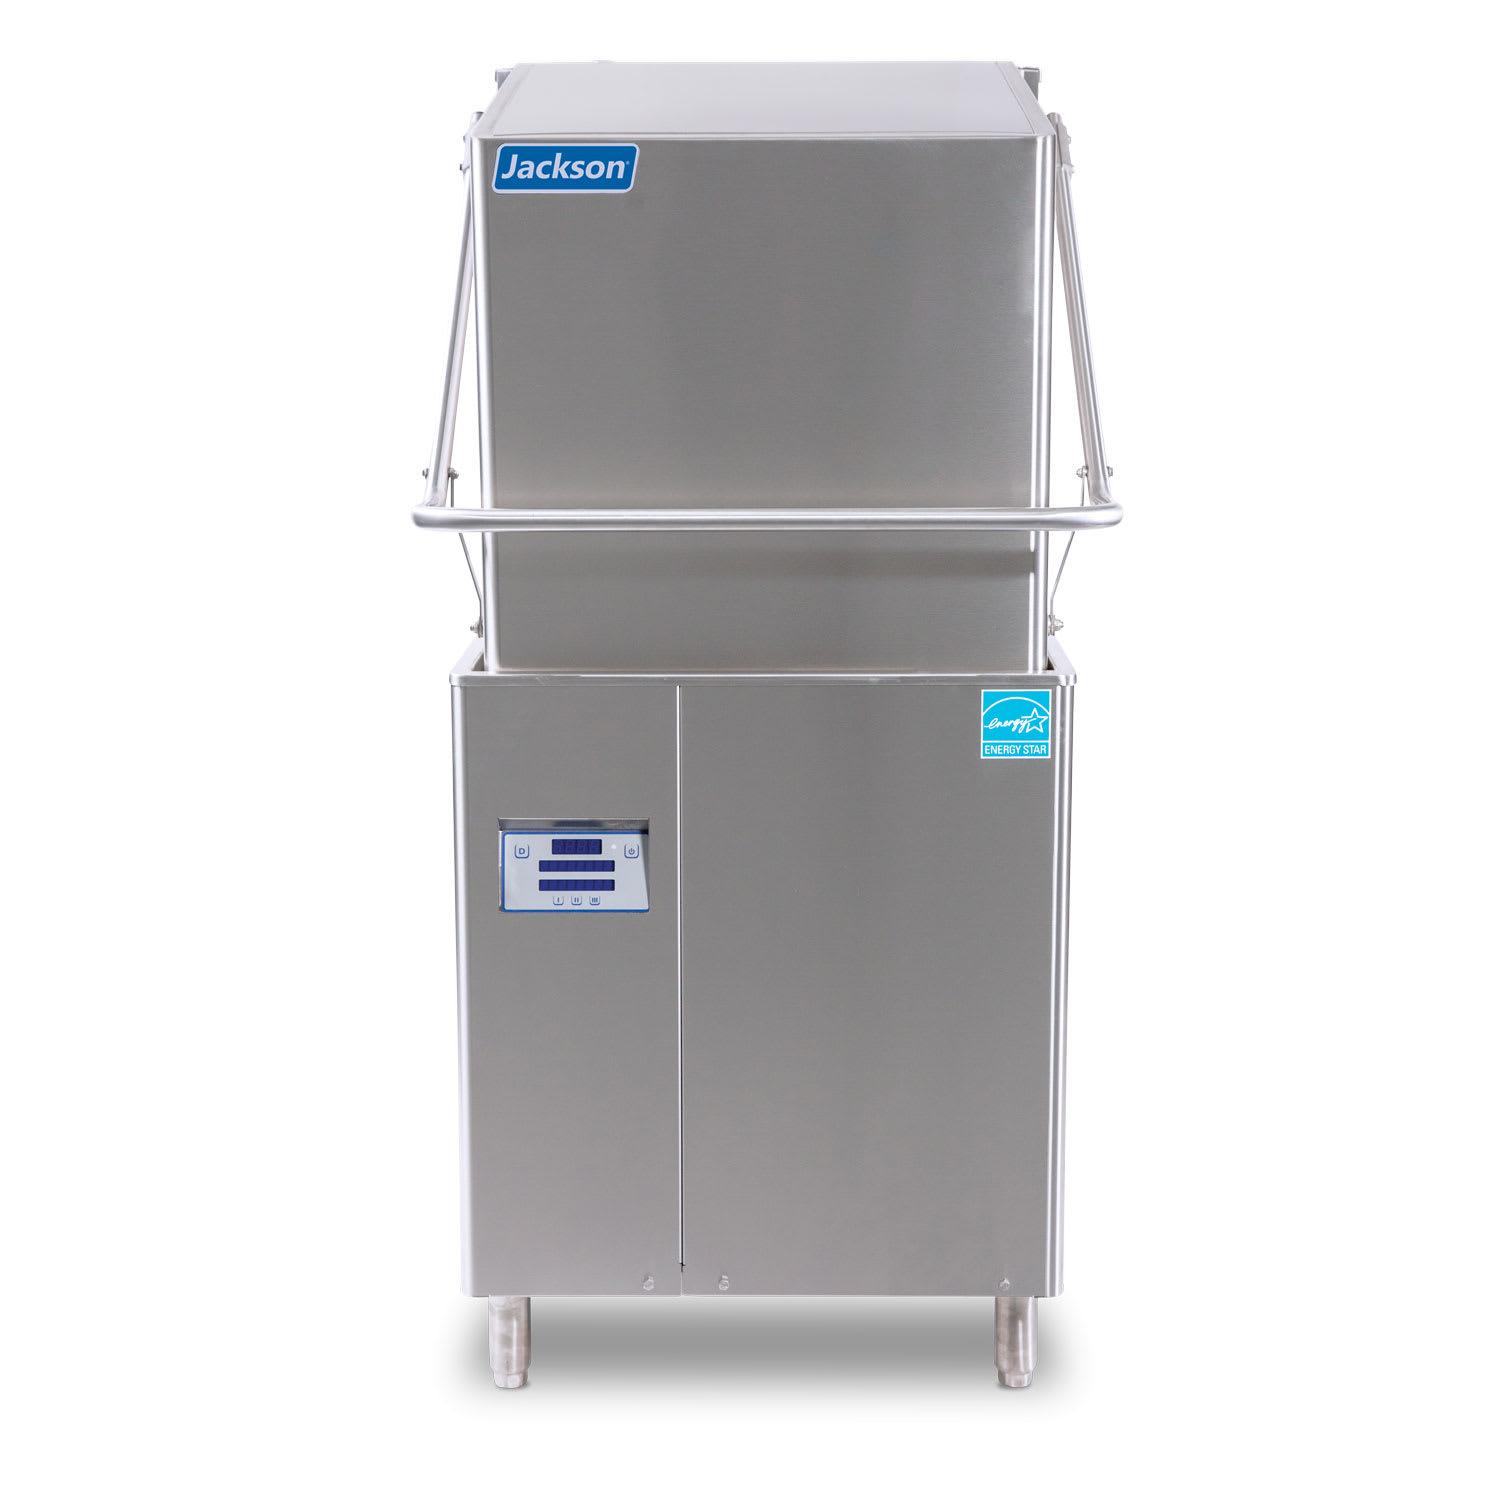 Jackson DYNATEMP High Temp Door-Type Dishwasher w/ Built-In Booster, 208v/1ph